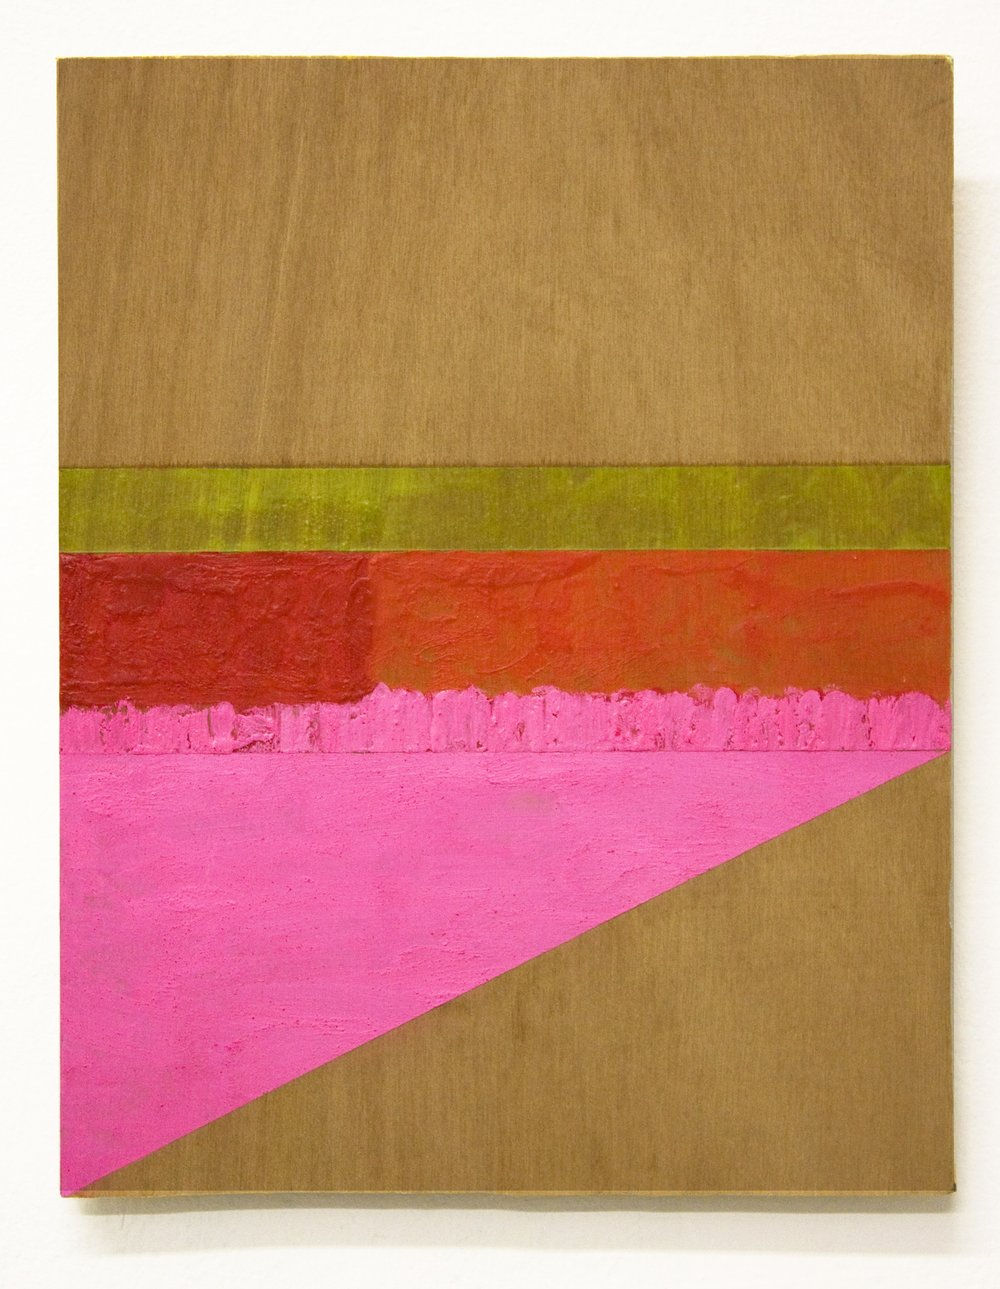 Untitled (Blinky Palermo series) , 2014   encaustic on plywood  27 x 21 cm  £800  [Ref. GK1]